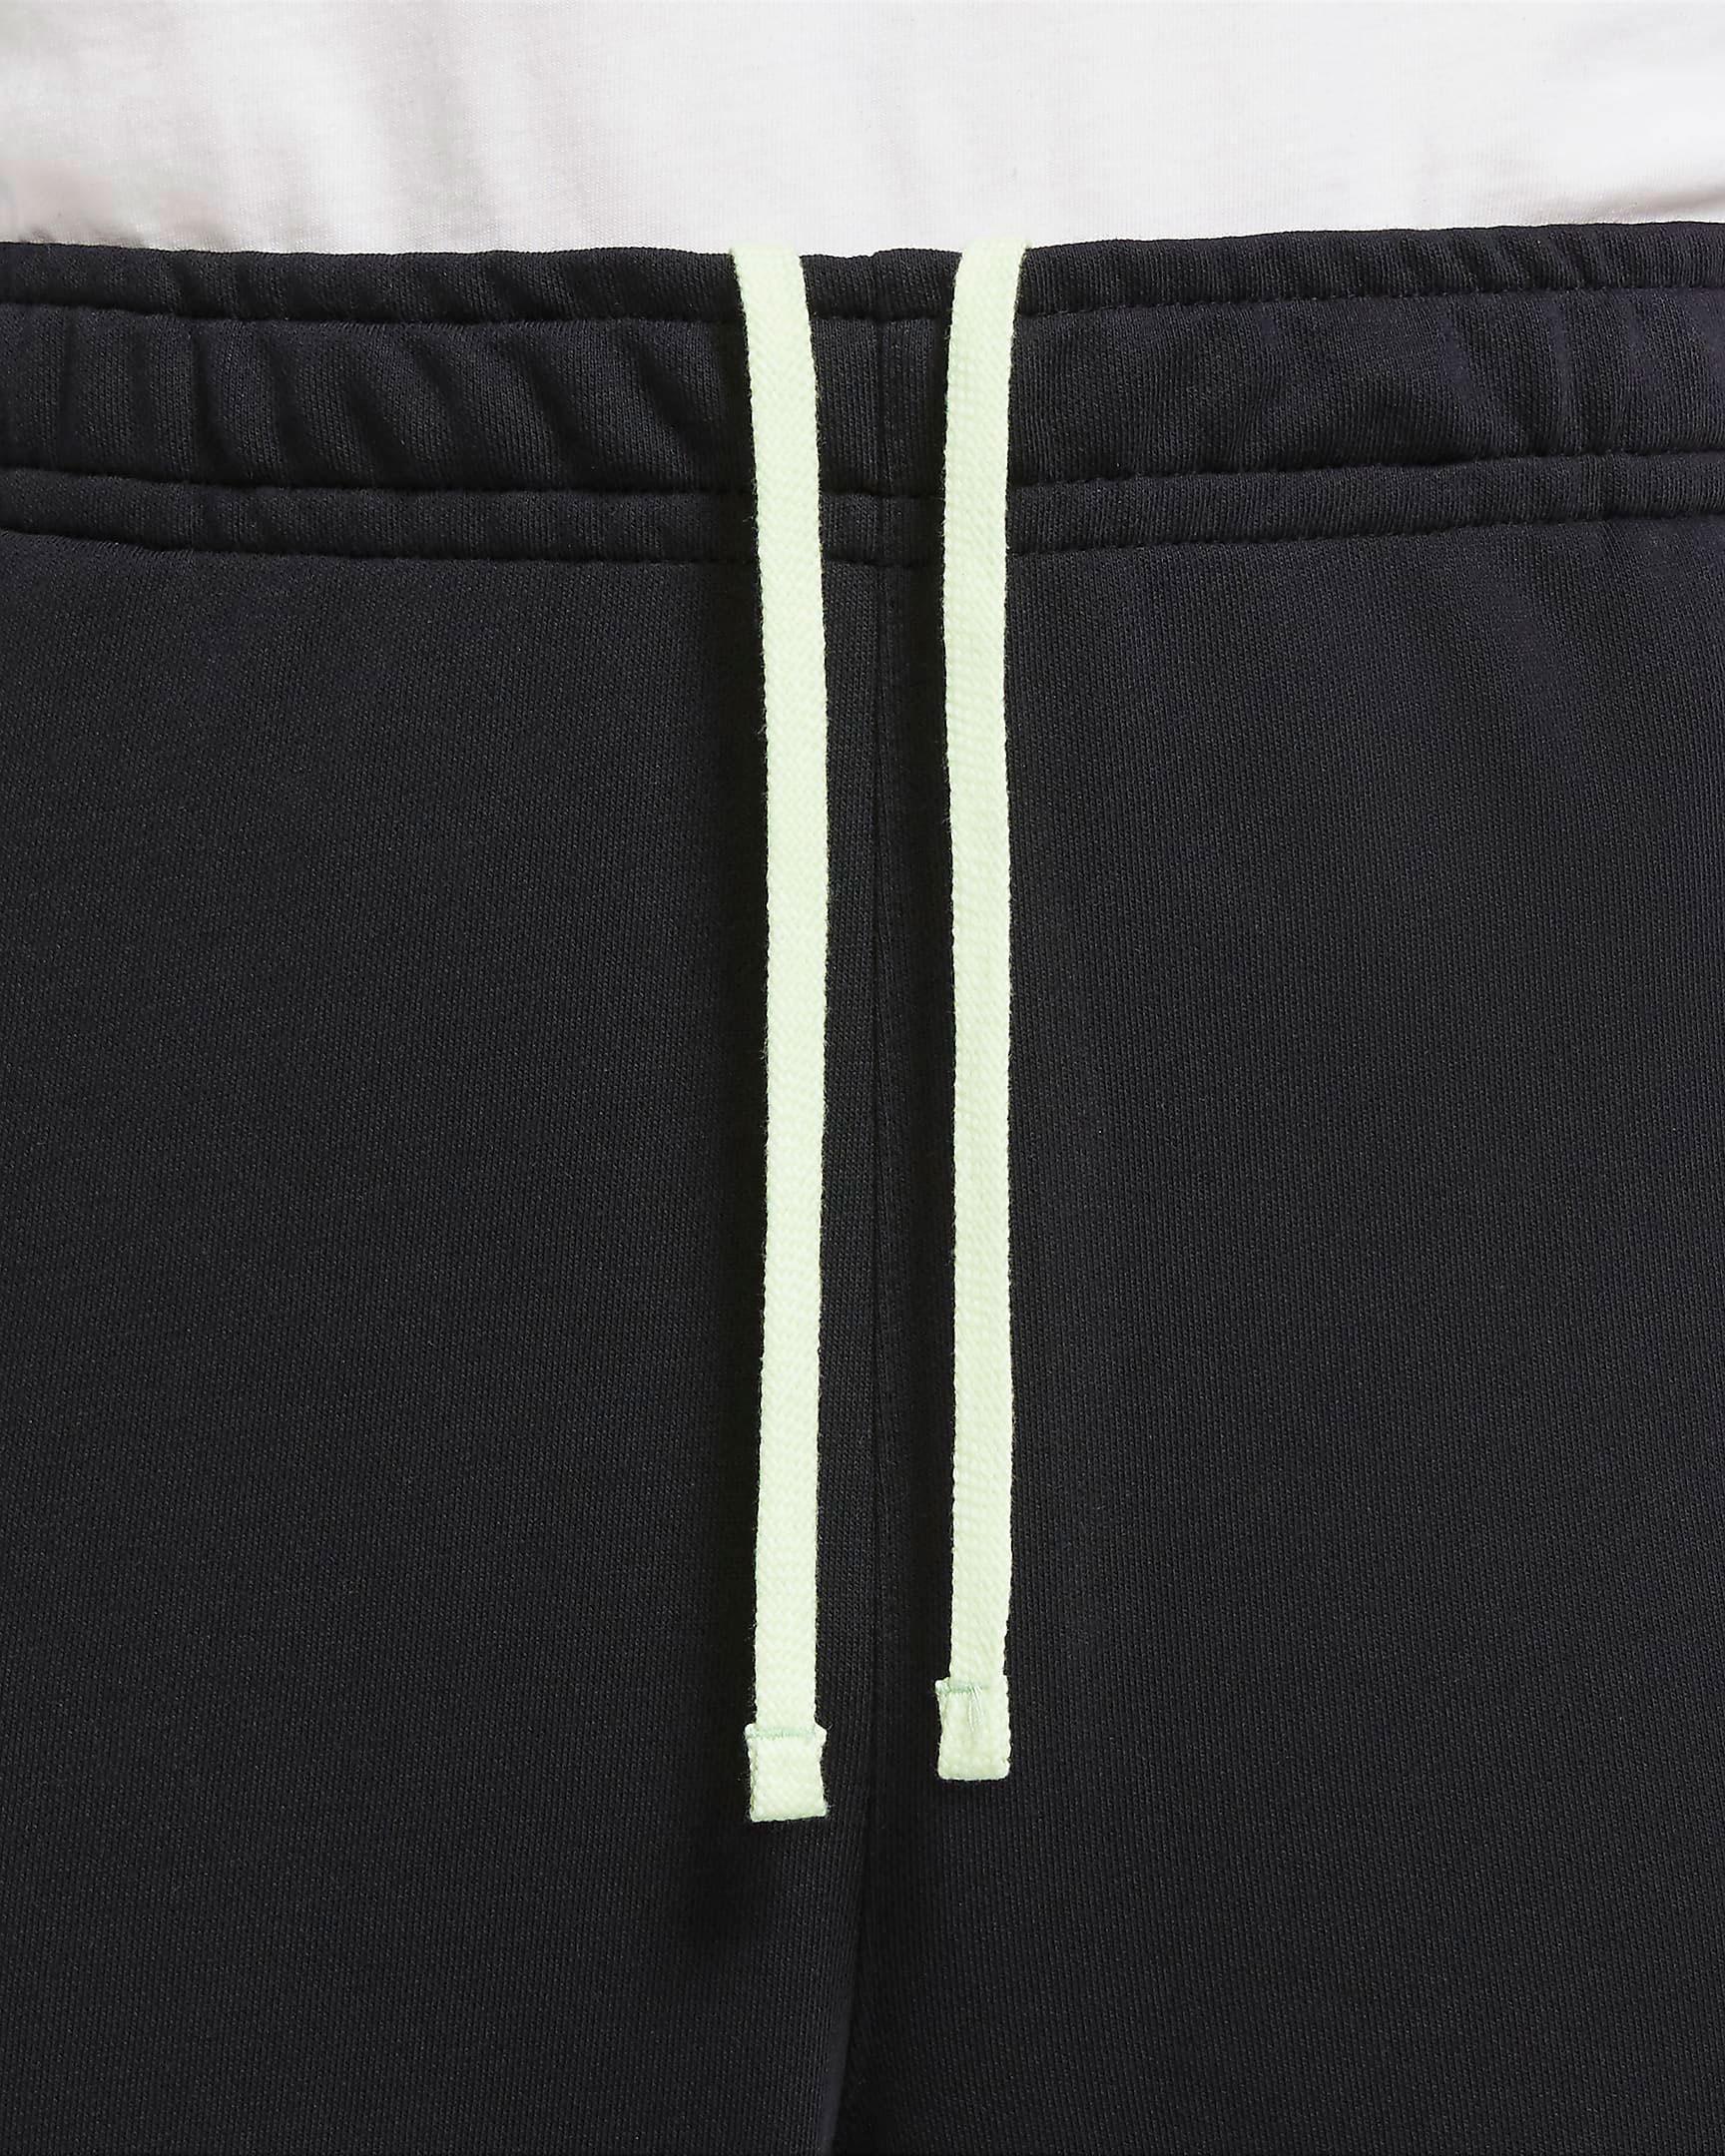 nike-sportswear-class-of-72-jogger-pants-black-volt-2